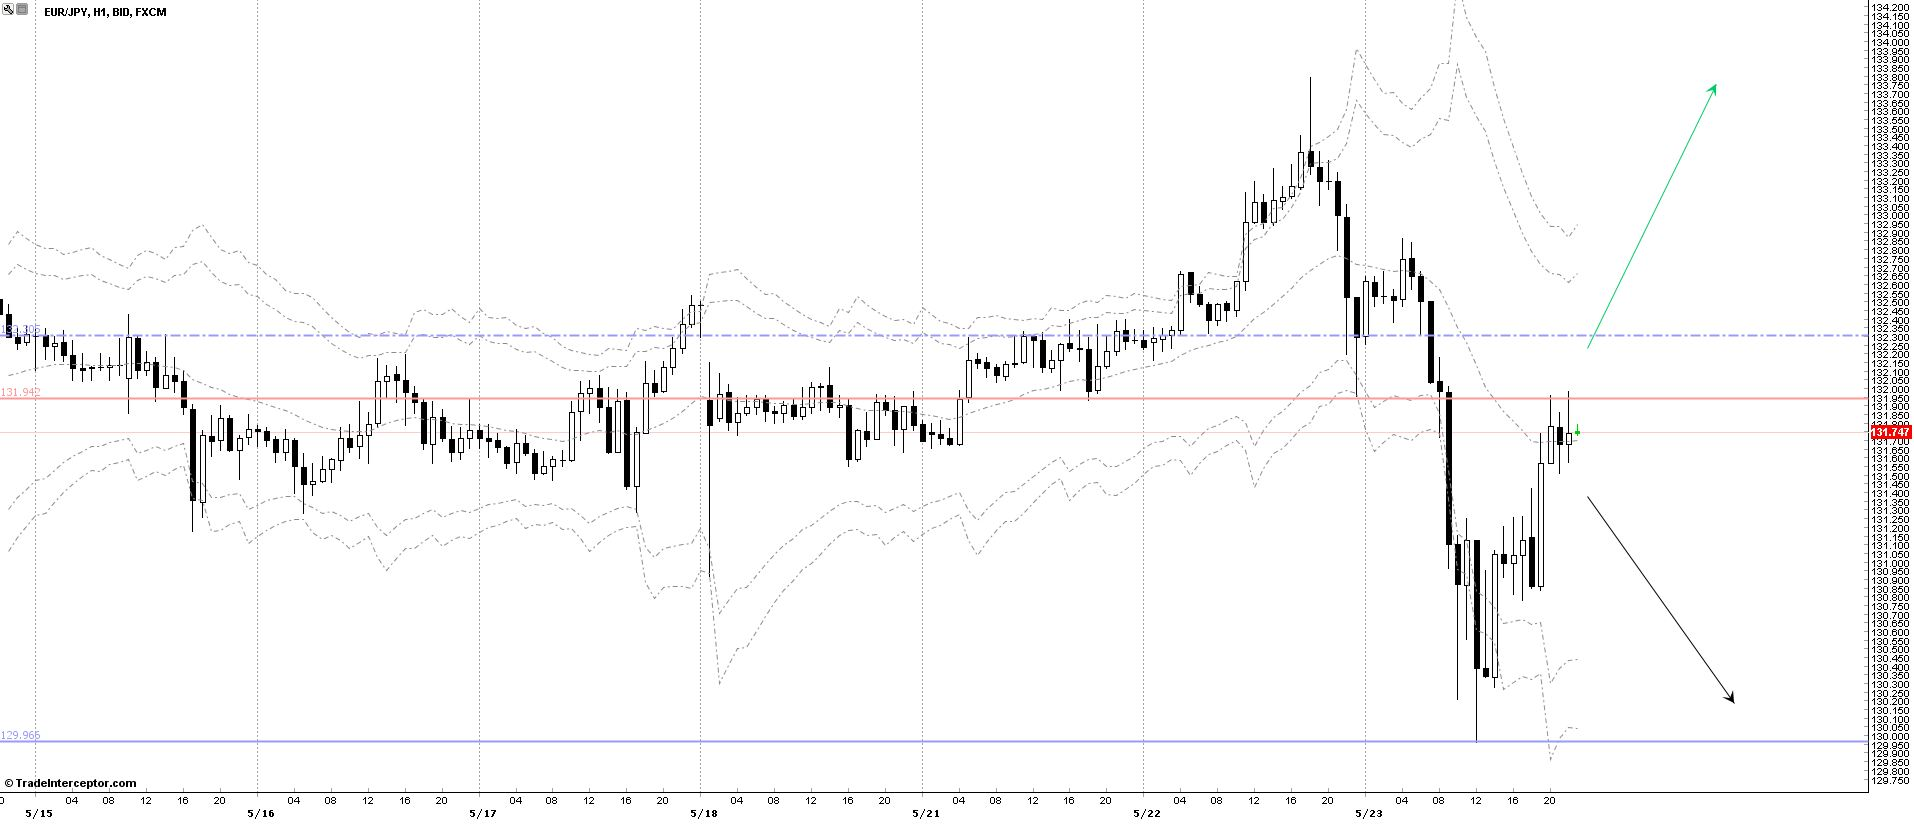 EURJPY Chart 23/05/2013